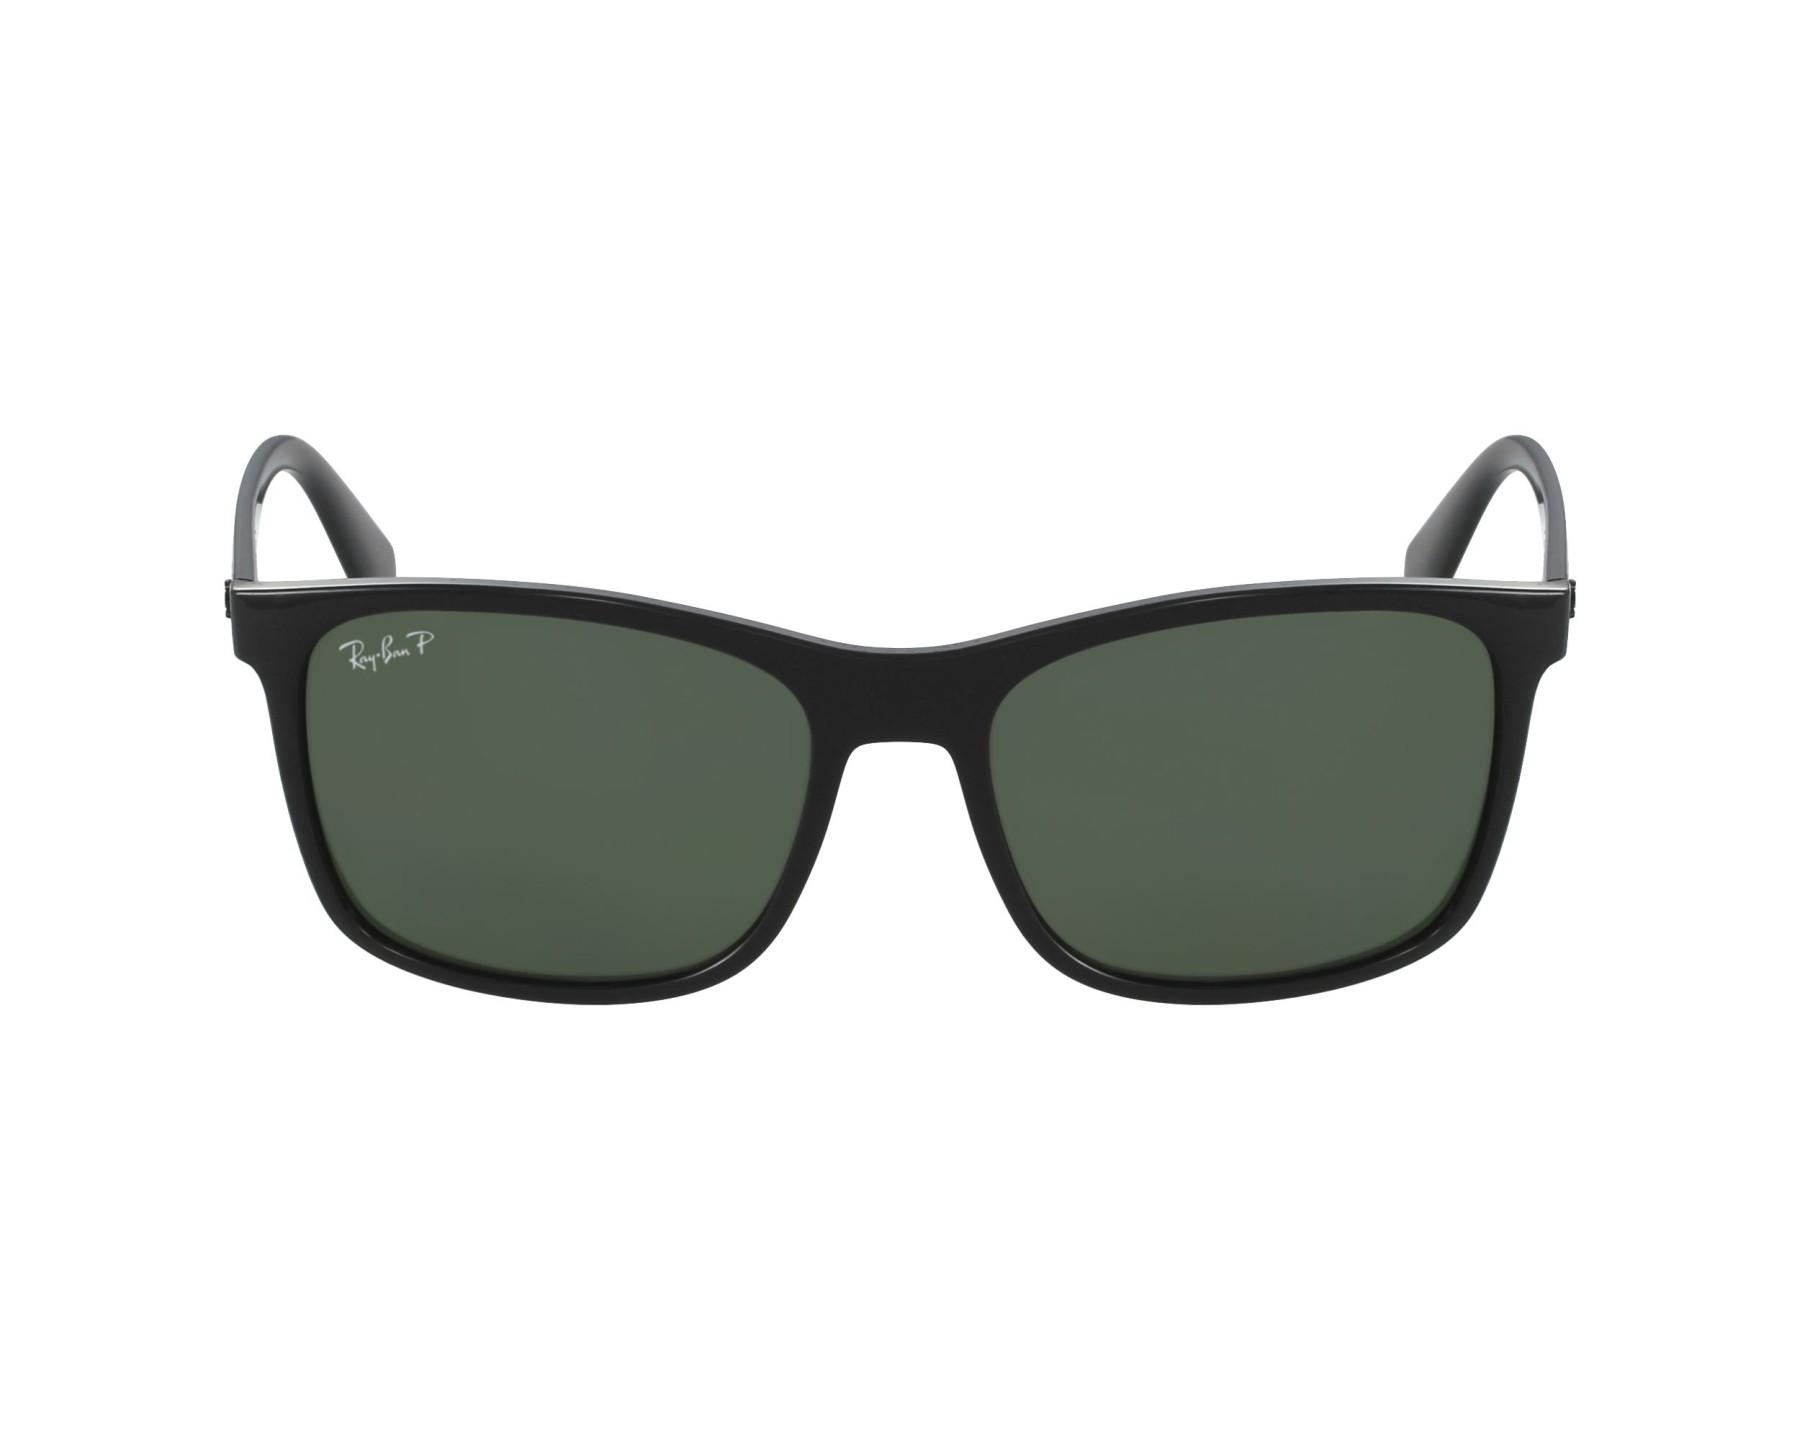 1f82ccf58b64 Polarized. Sunglasses Ray-Ban RB-4232 601/9A 57-17 Black profile view